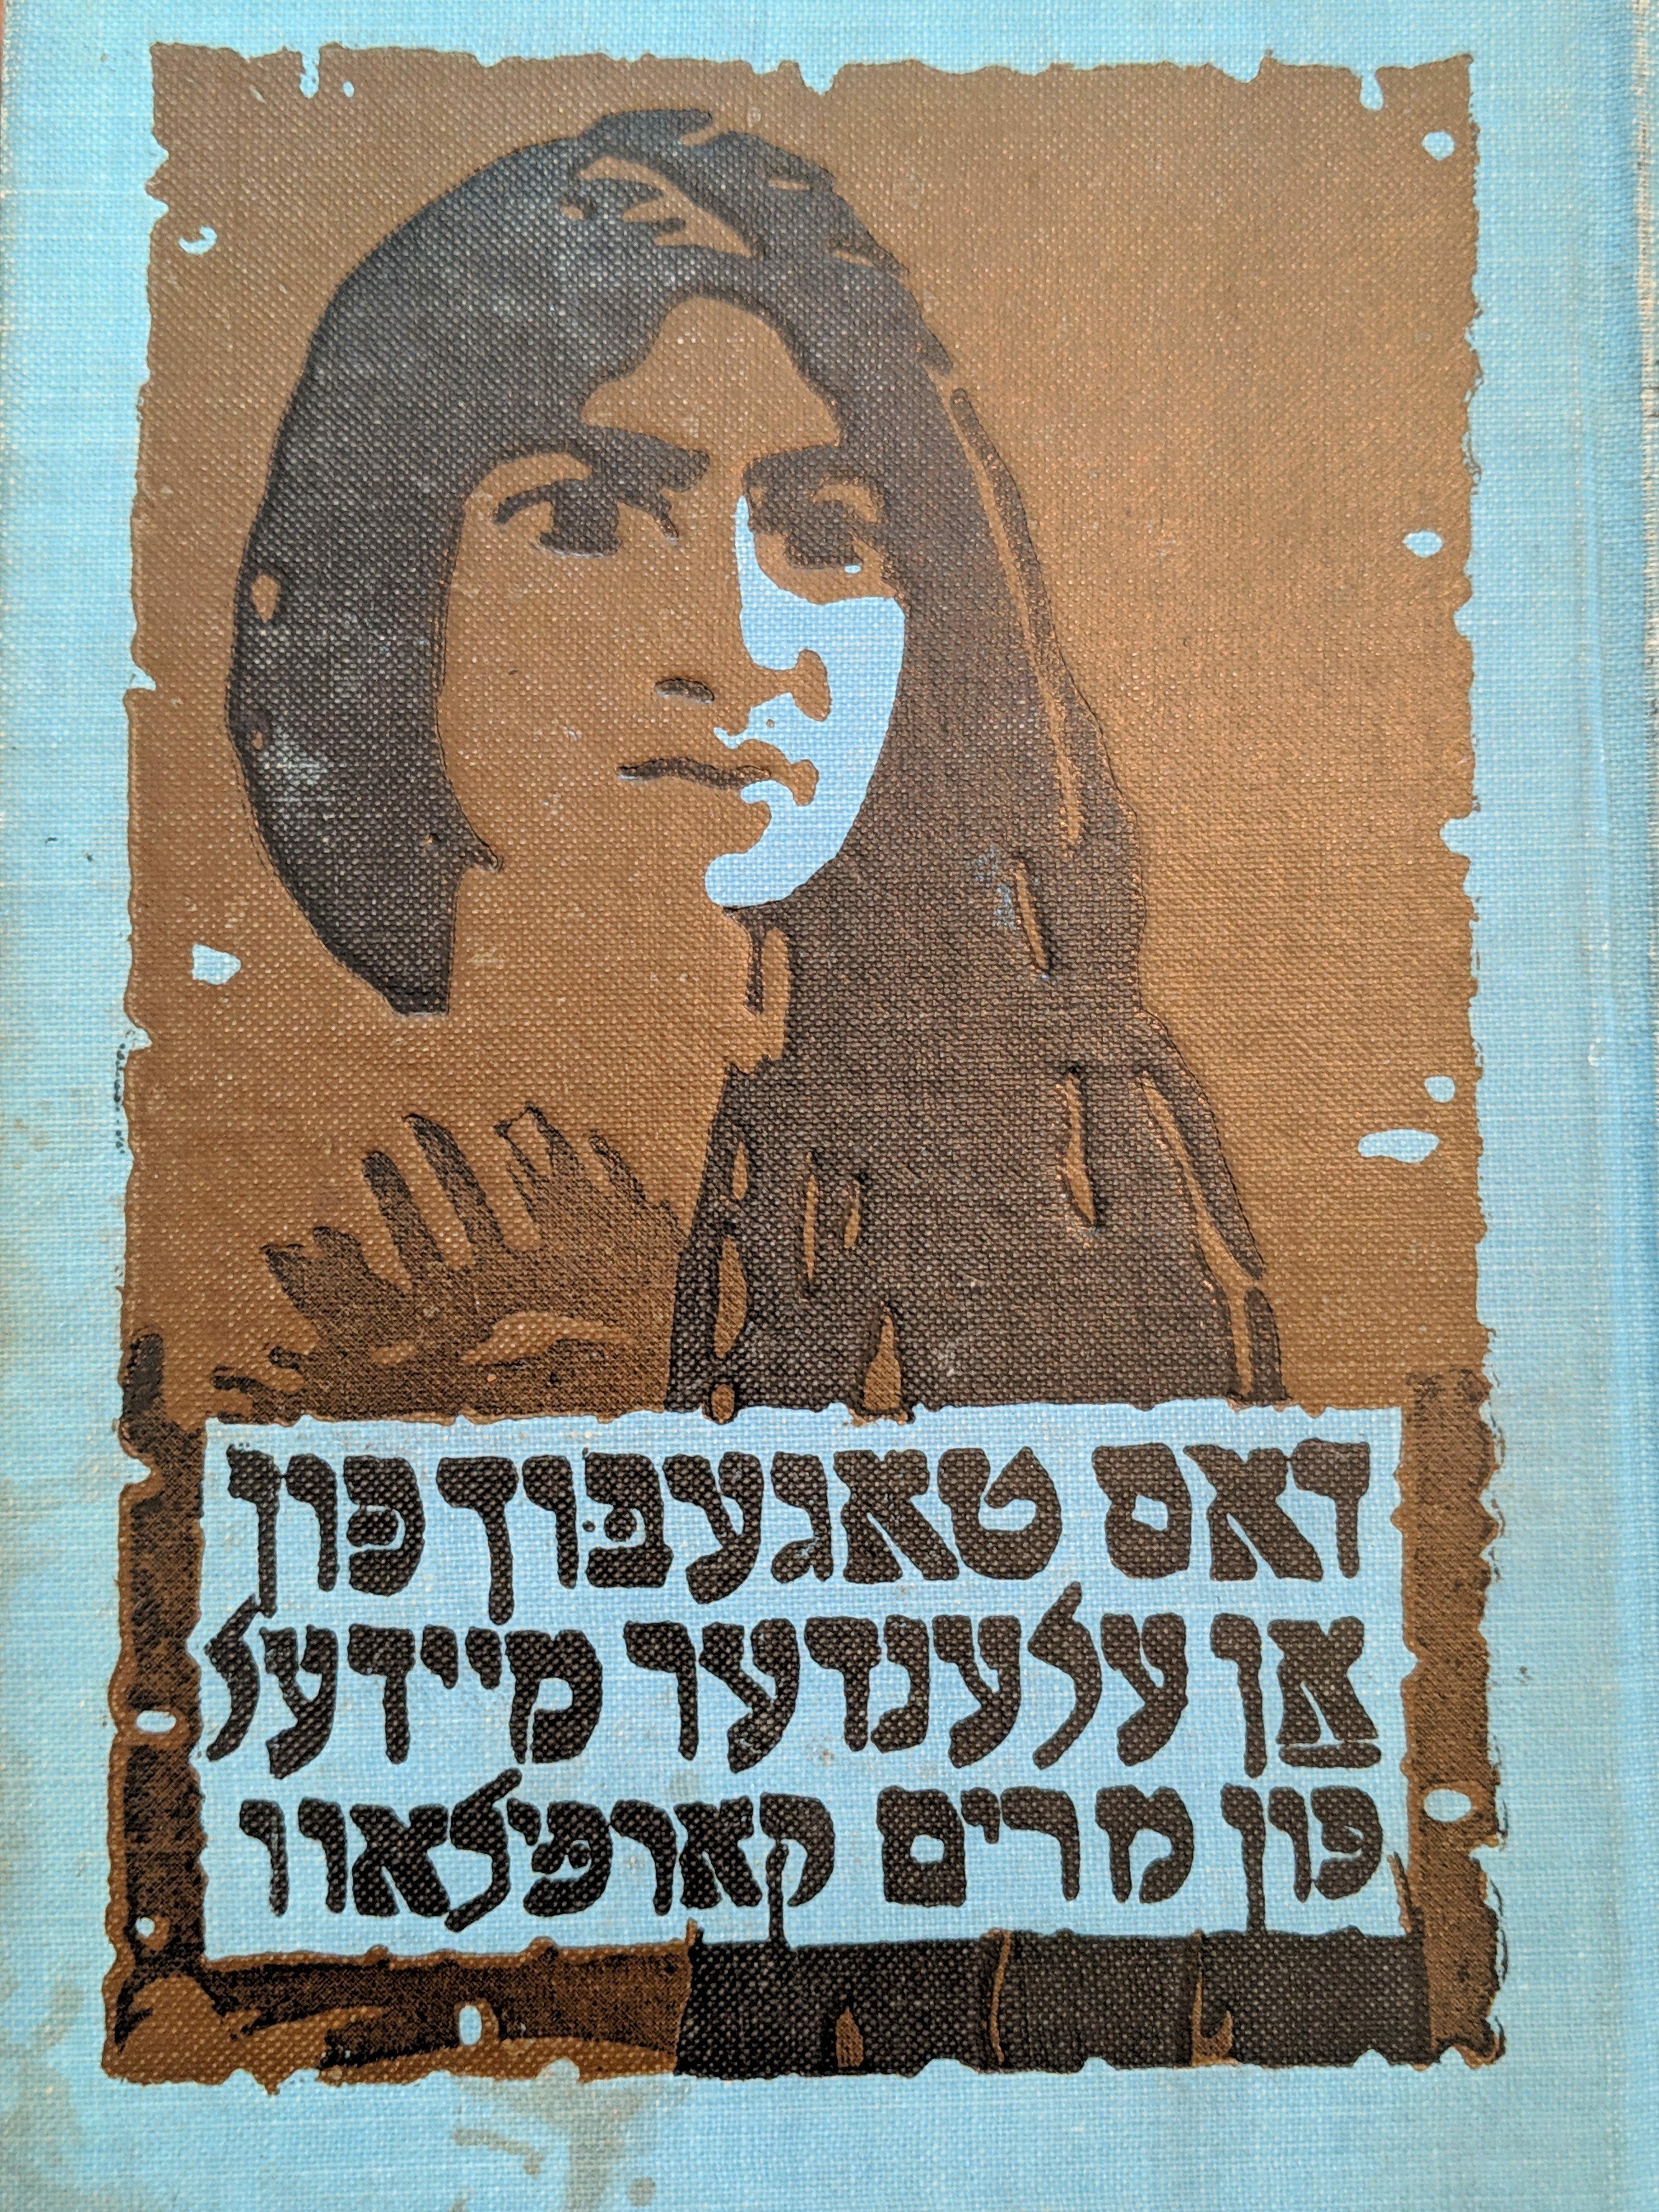 "<p>Miriam Karpilove, <em>Tage-bukh fun a&nbsp;elende meydel, oder der kampf gegen fraye liebe</em><br> (S. Kantrowitz, <span class=""numbers"">1918</span>).</p>"